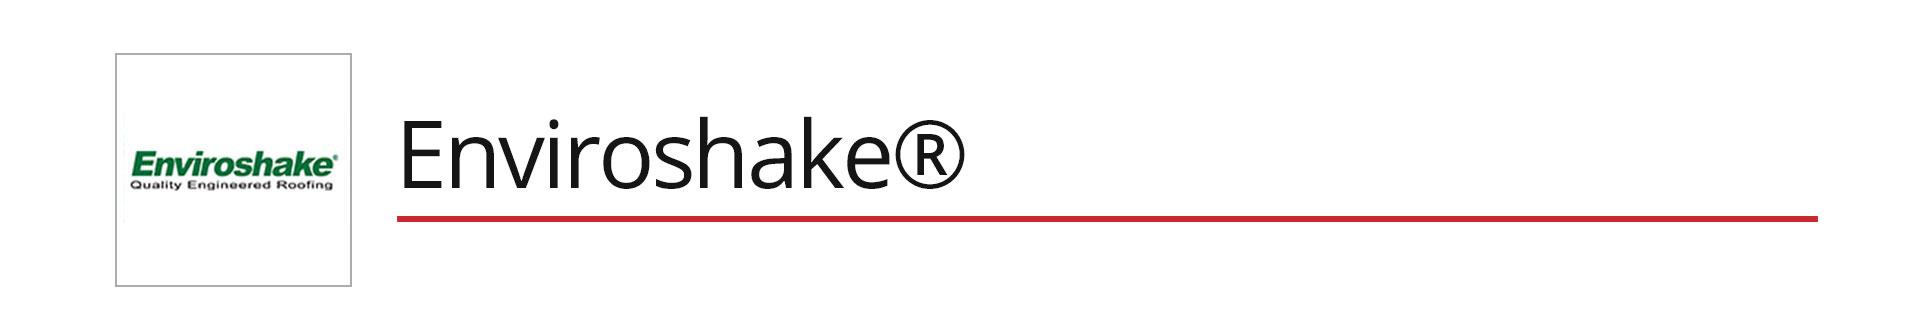 Enviroshake_CADBlock-Header.jpg